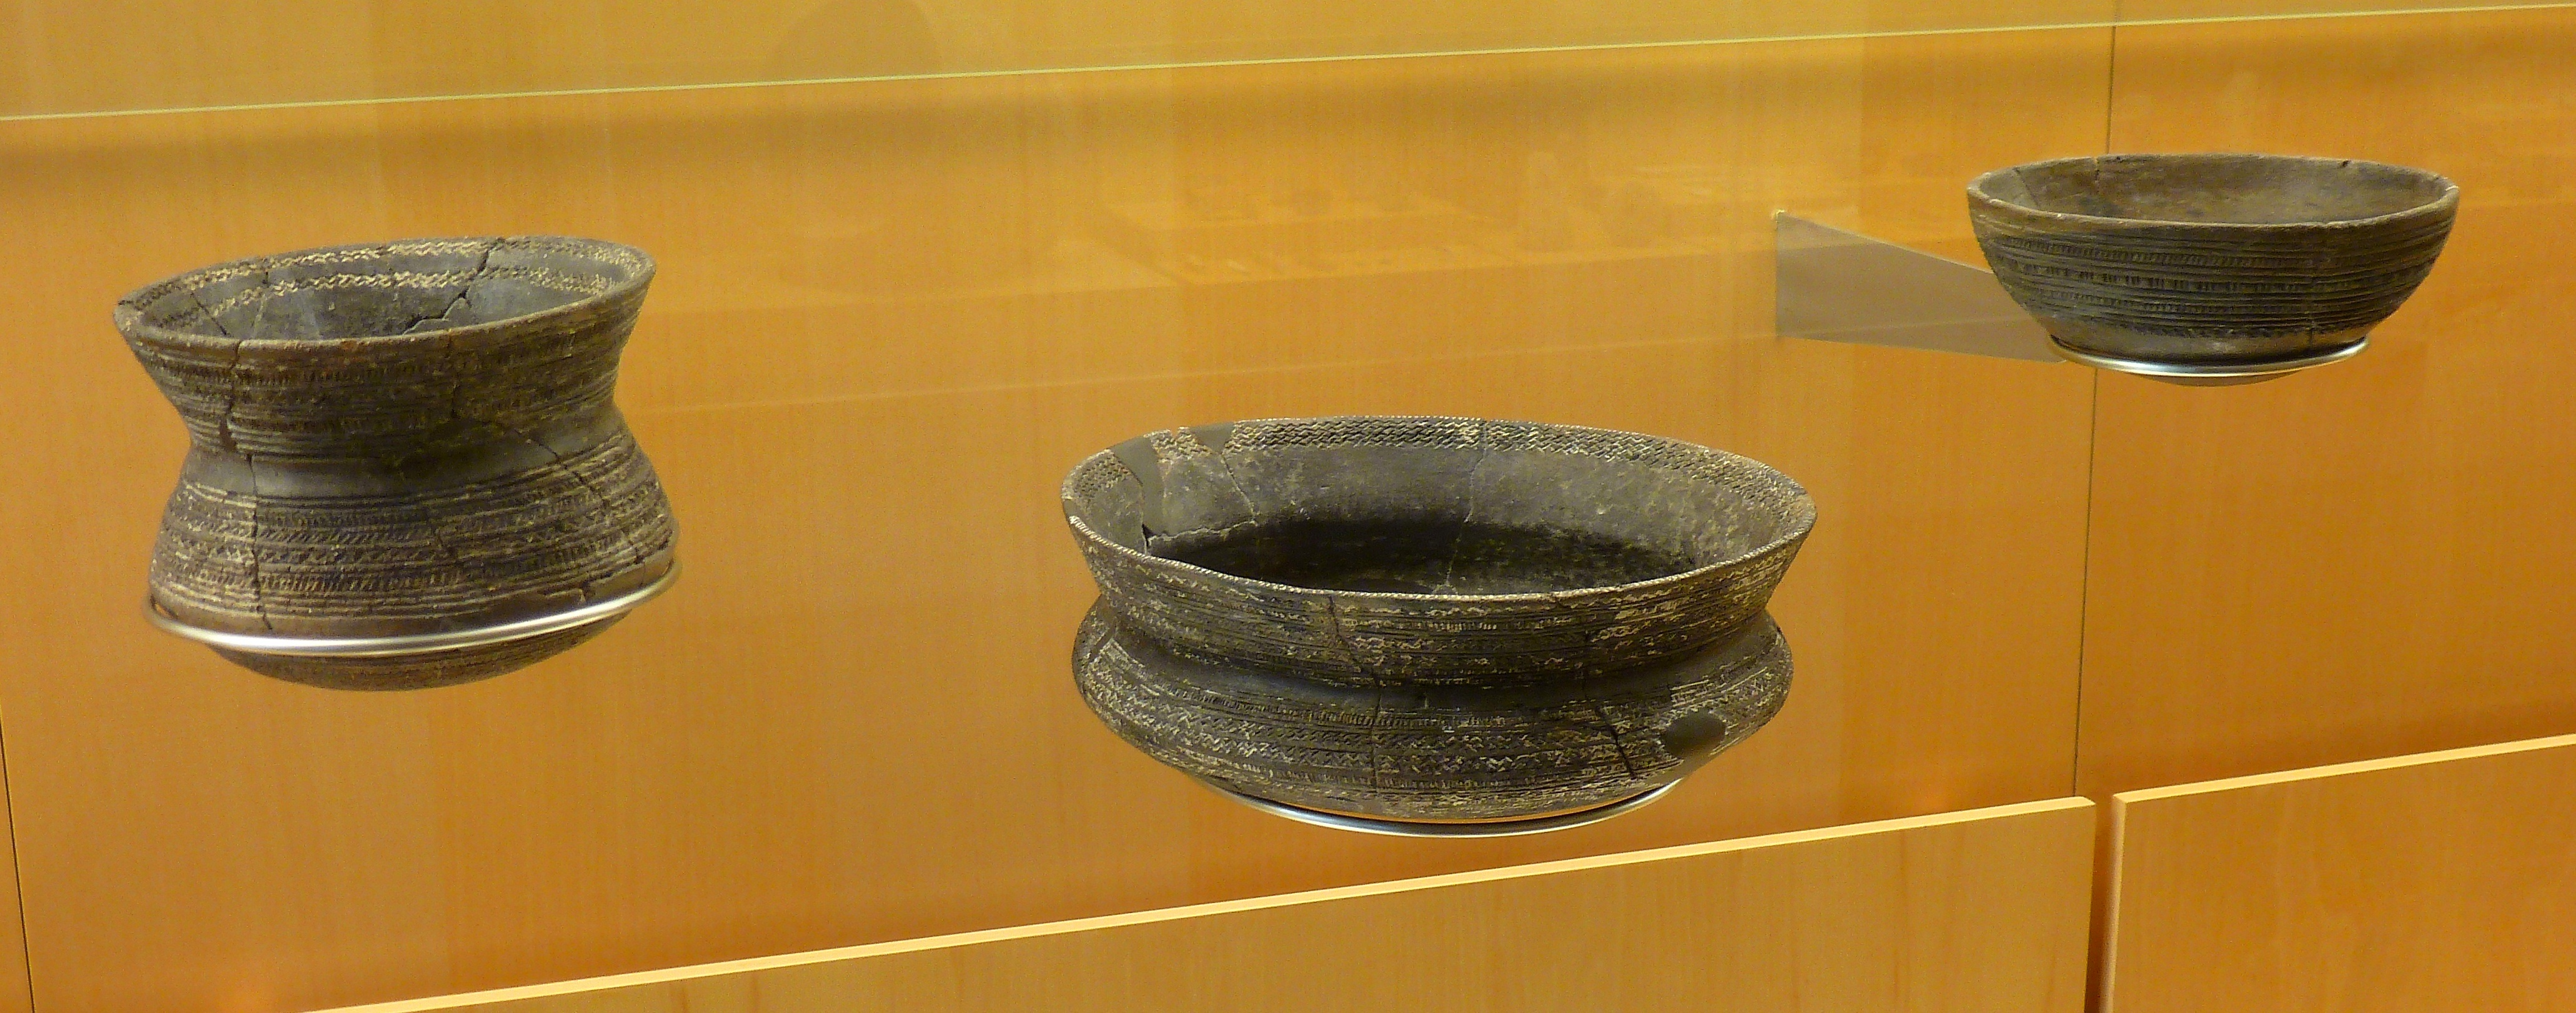 Art stica expresi n pl sticas en la poca prehistorica for Origen de la ceramica